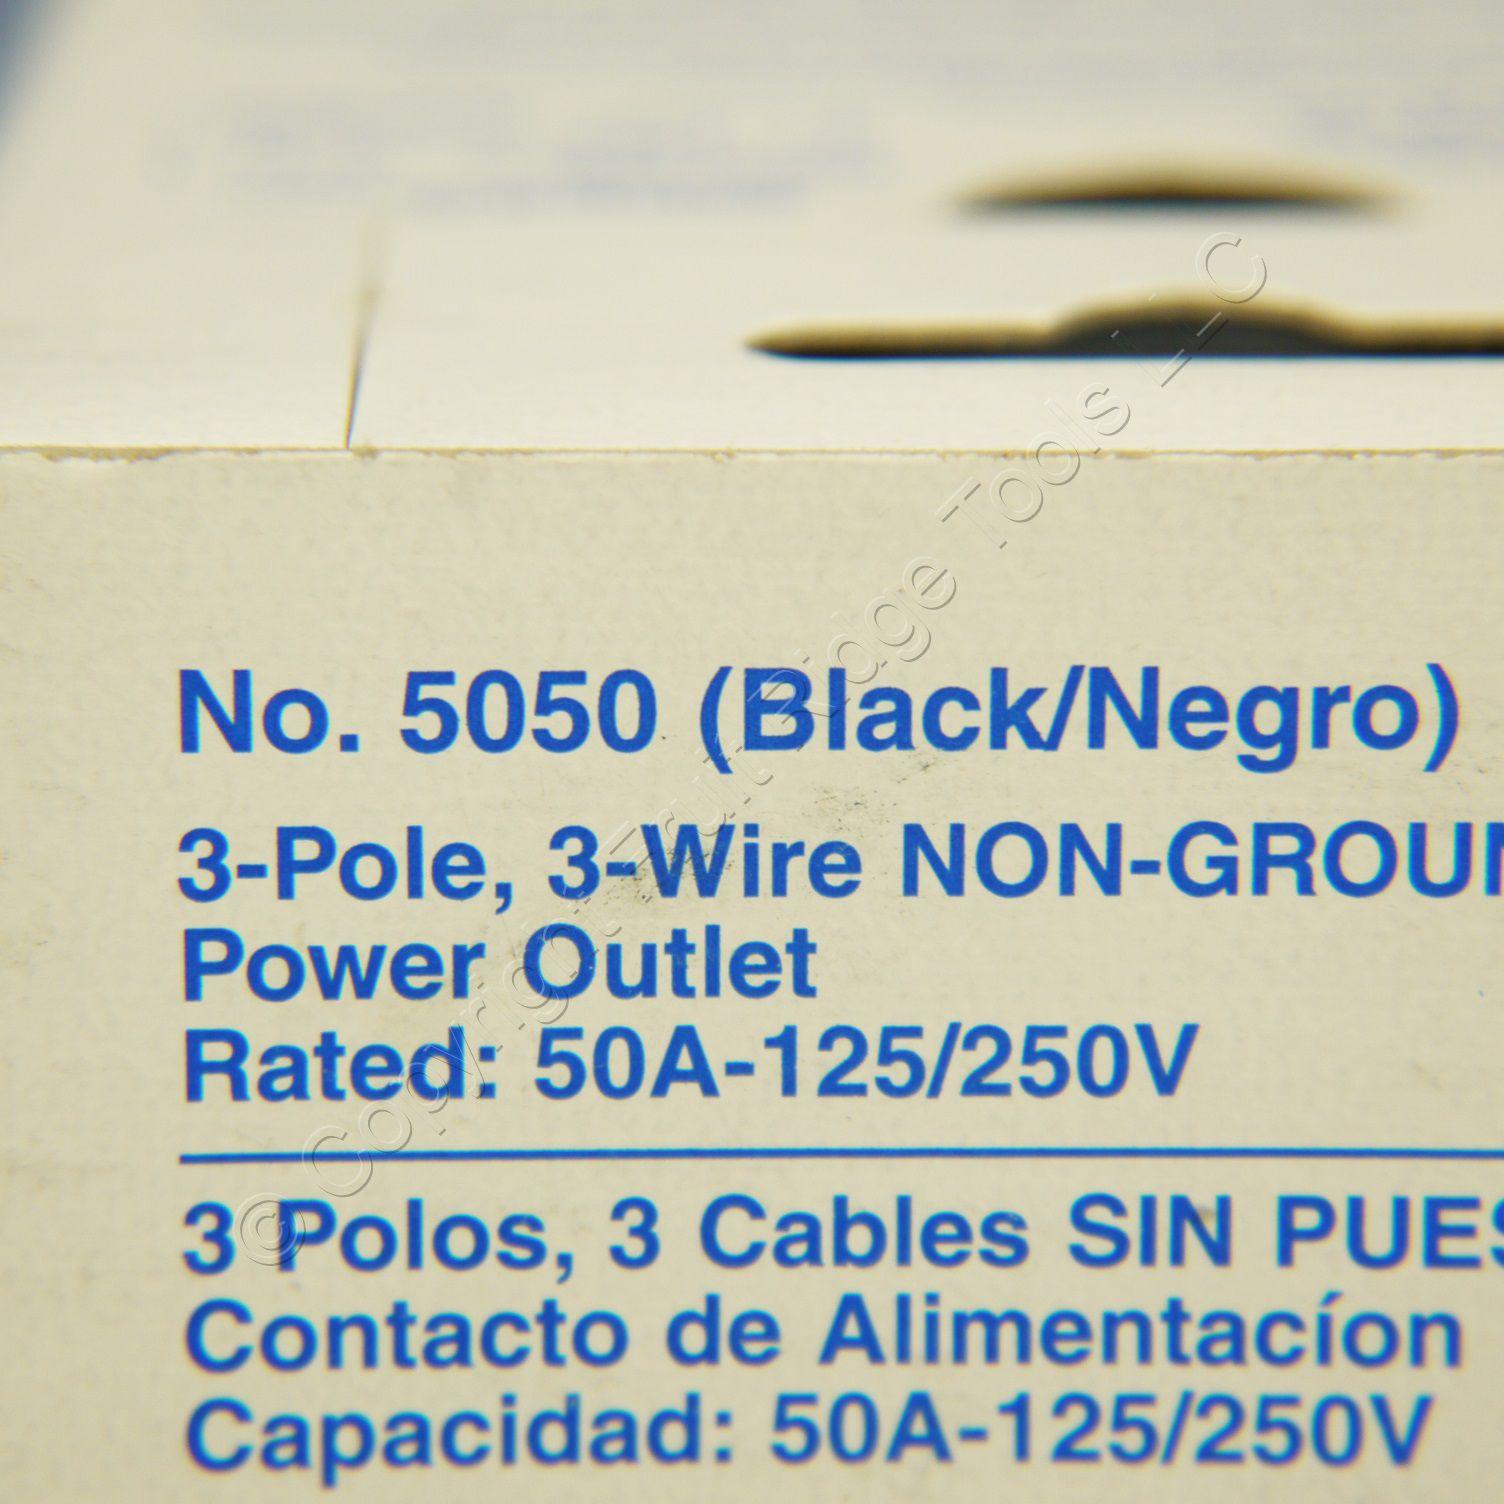 Leviton 50A NEMA 10-50R  Black 3 Pole Non-Grounding Range Power Outlet 5050